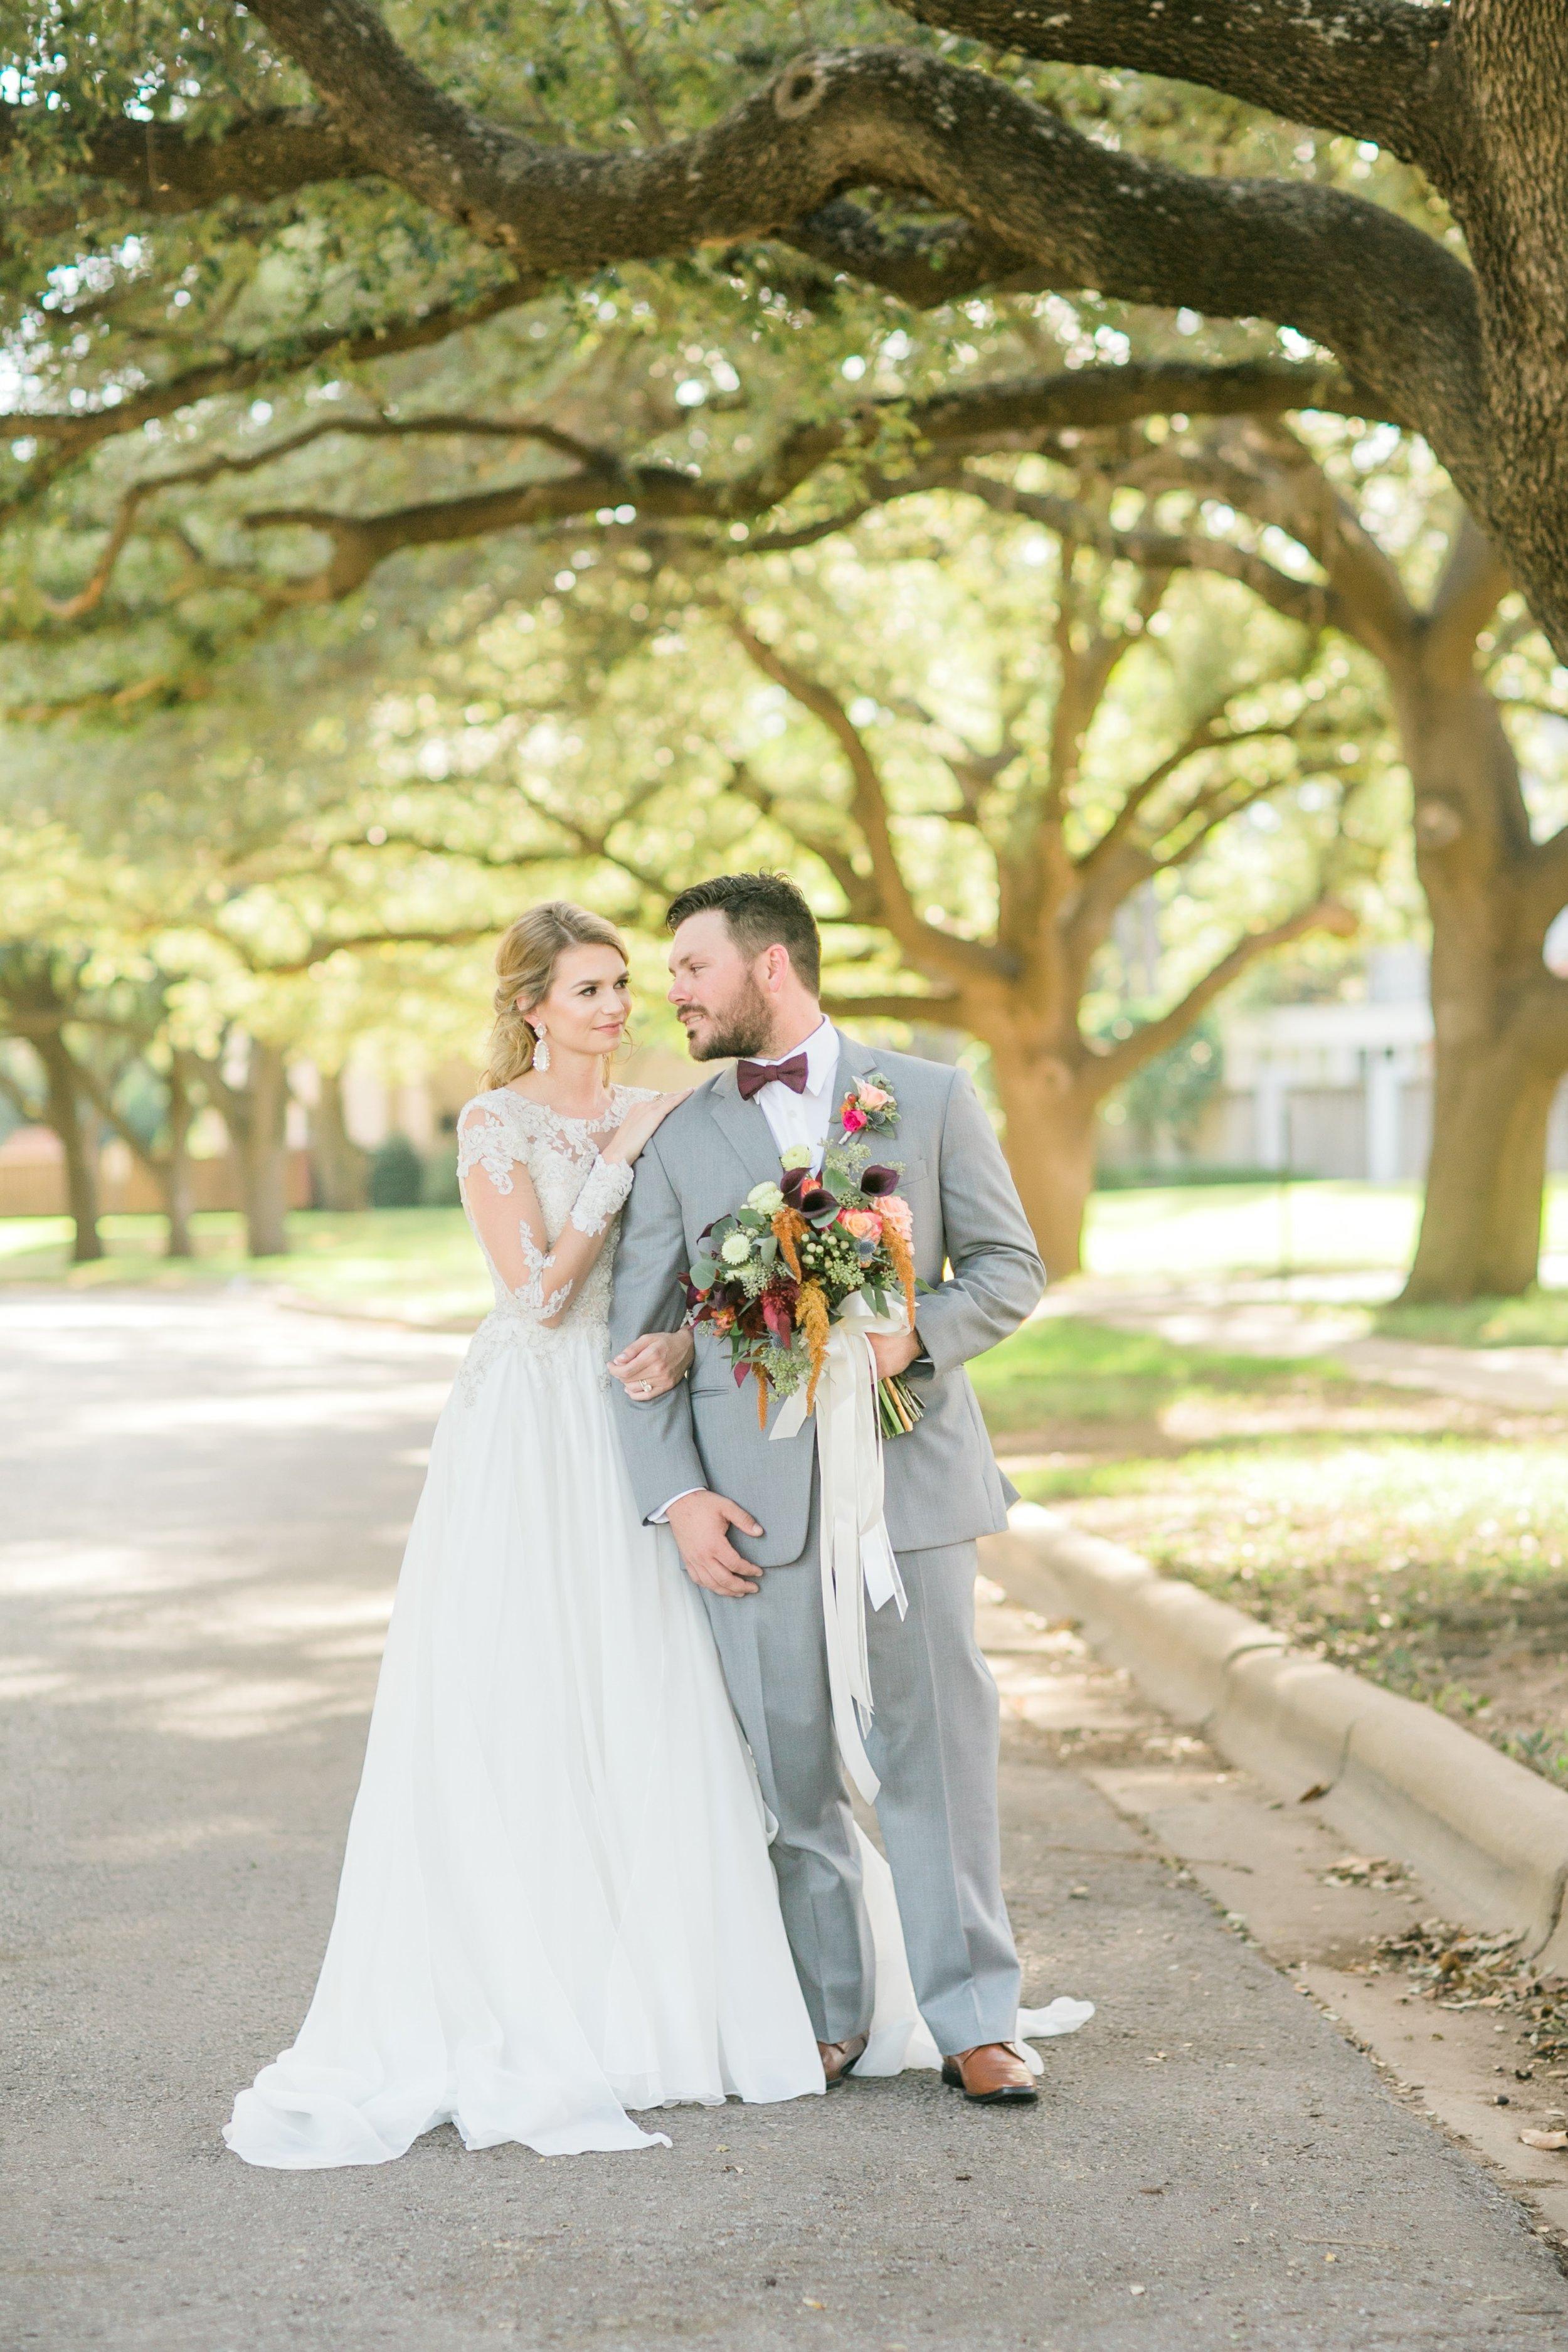 Roberson-Wedding-The-Forum-Lauren-Pinson-Wedding-Photography-Wichita-Falls-Texas-046.jpg